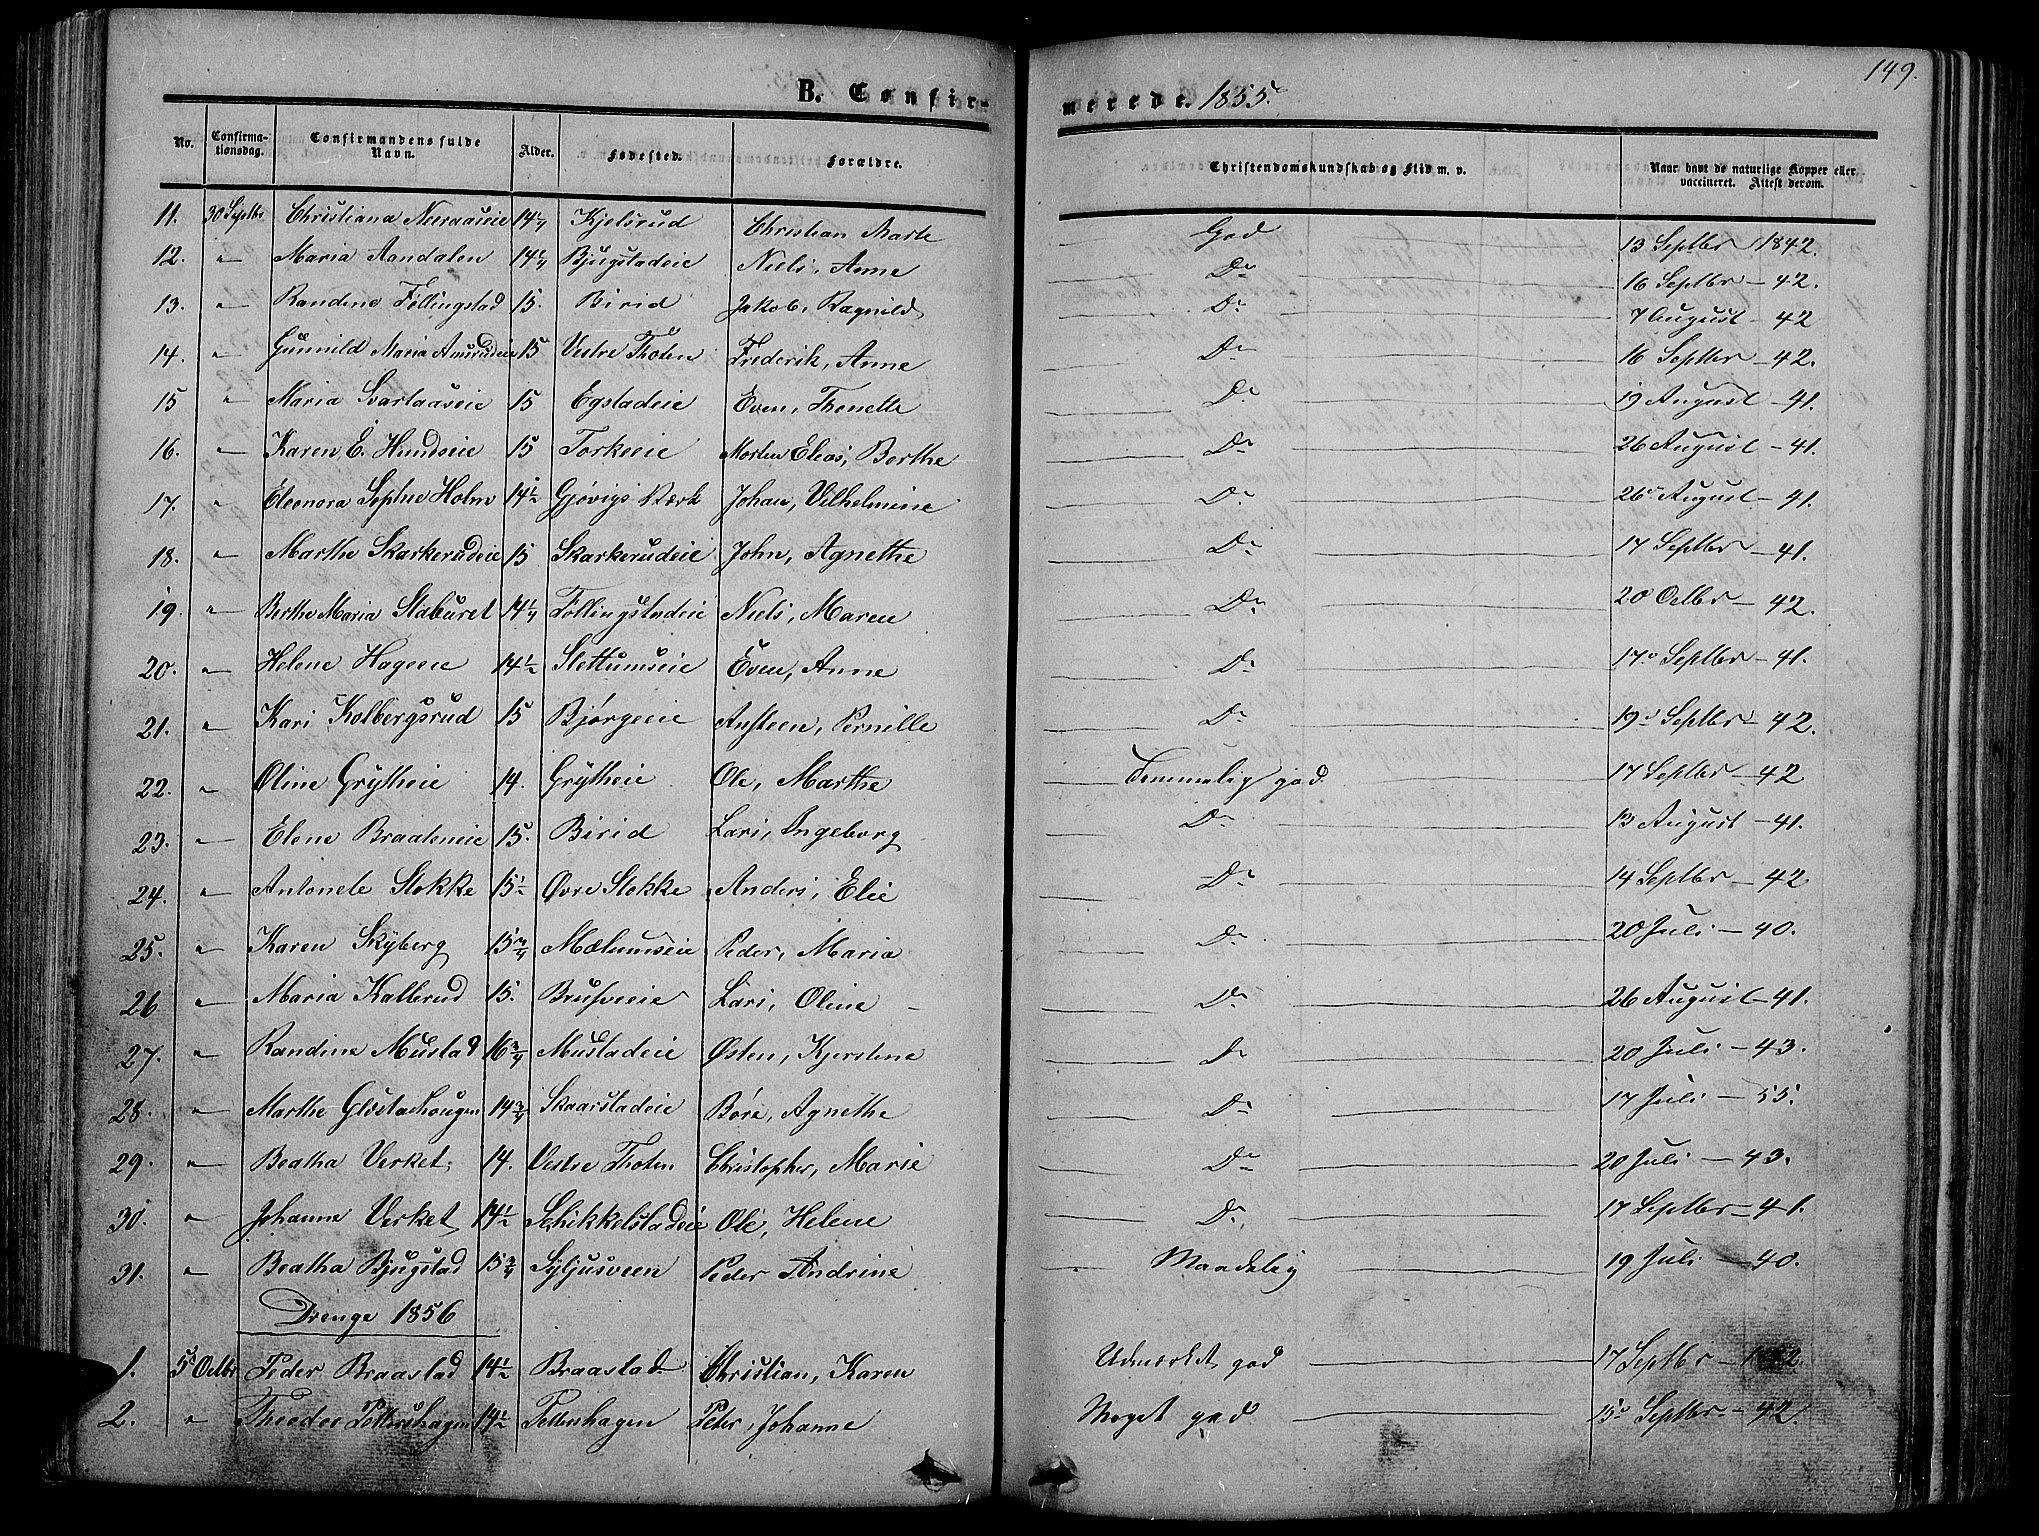 SAH, Vardal prestekontor, H/Ha/Hab/L0005: Klokkerbok nr. 5, 1854-1868, s. 149